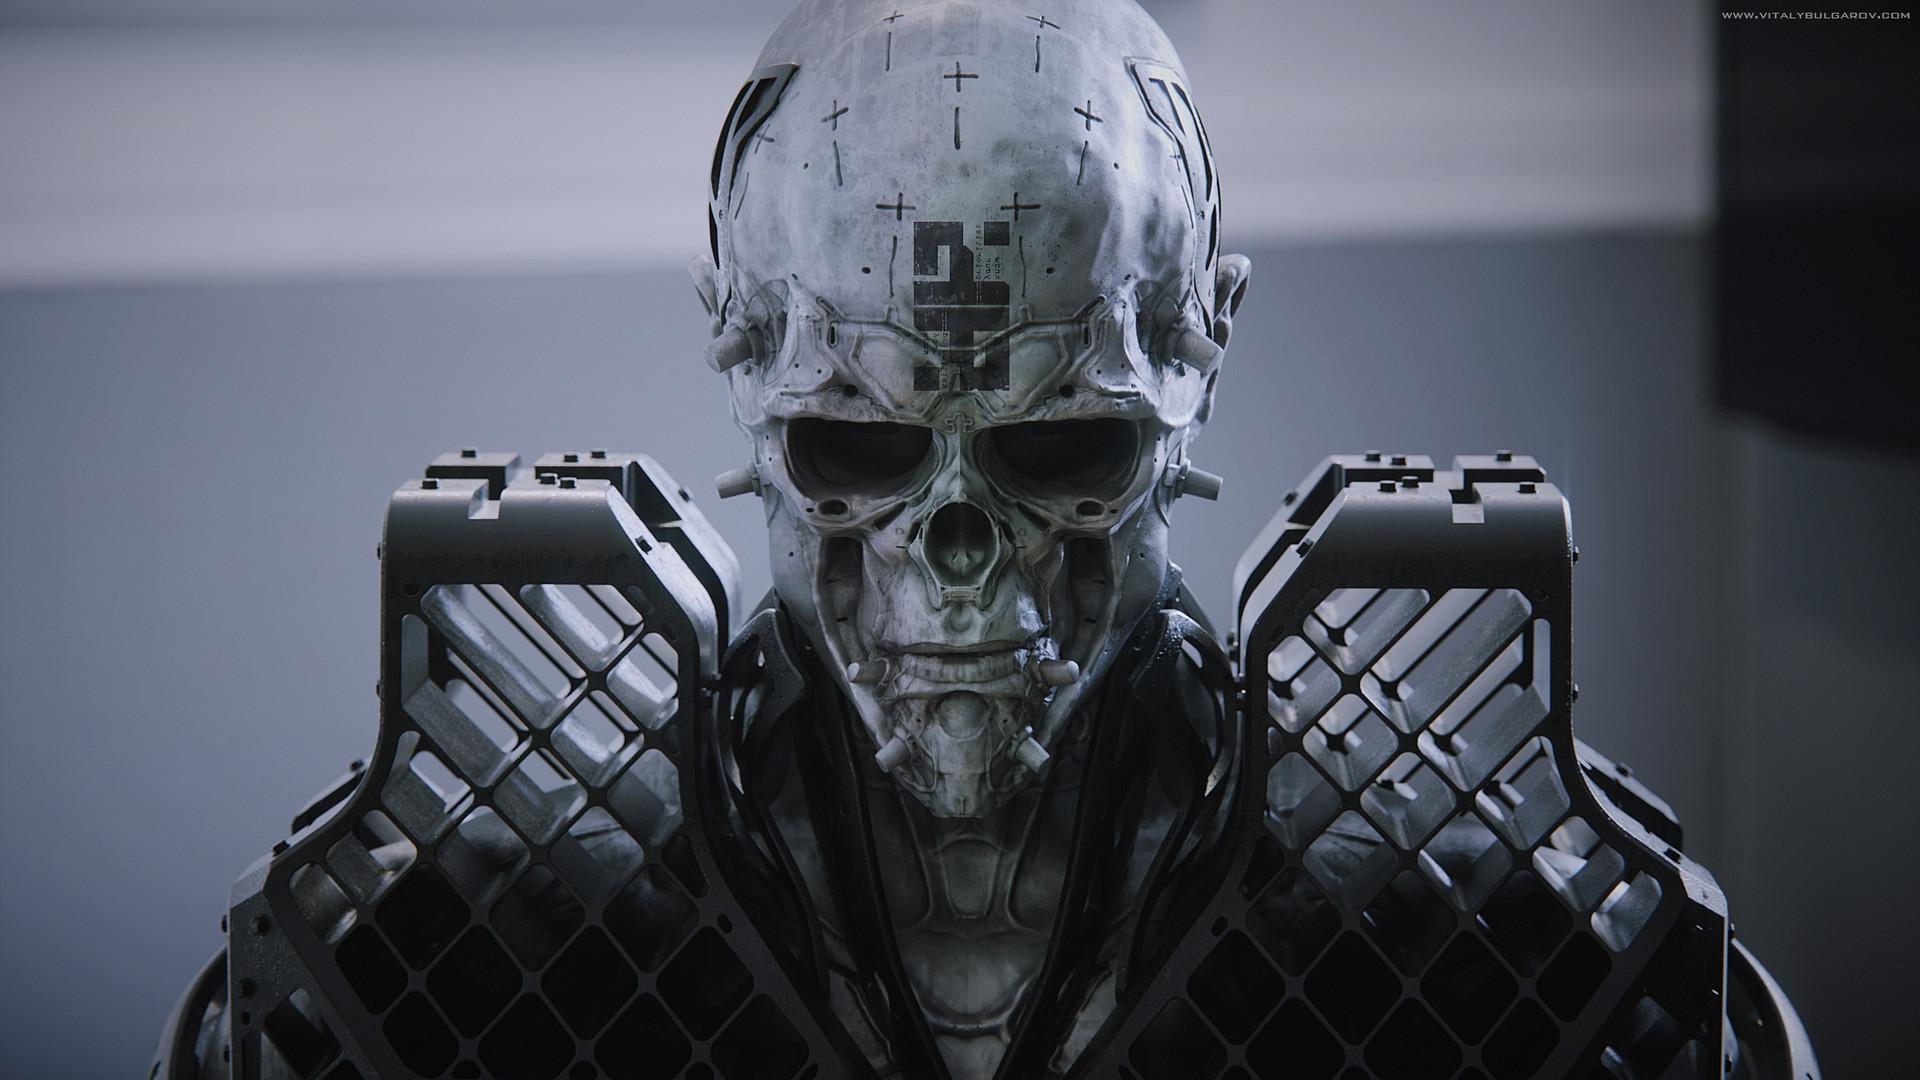 The Futuristic 3d Art of Vitaly Bulgarov